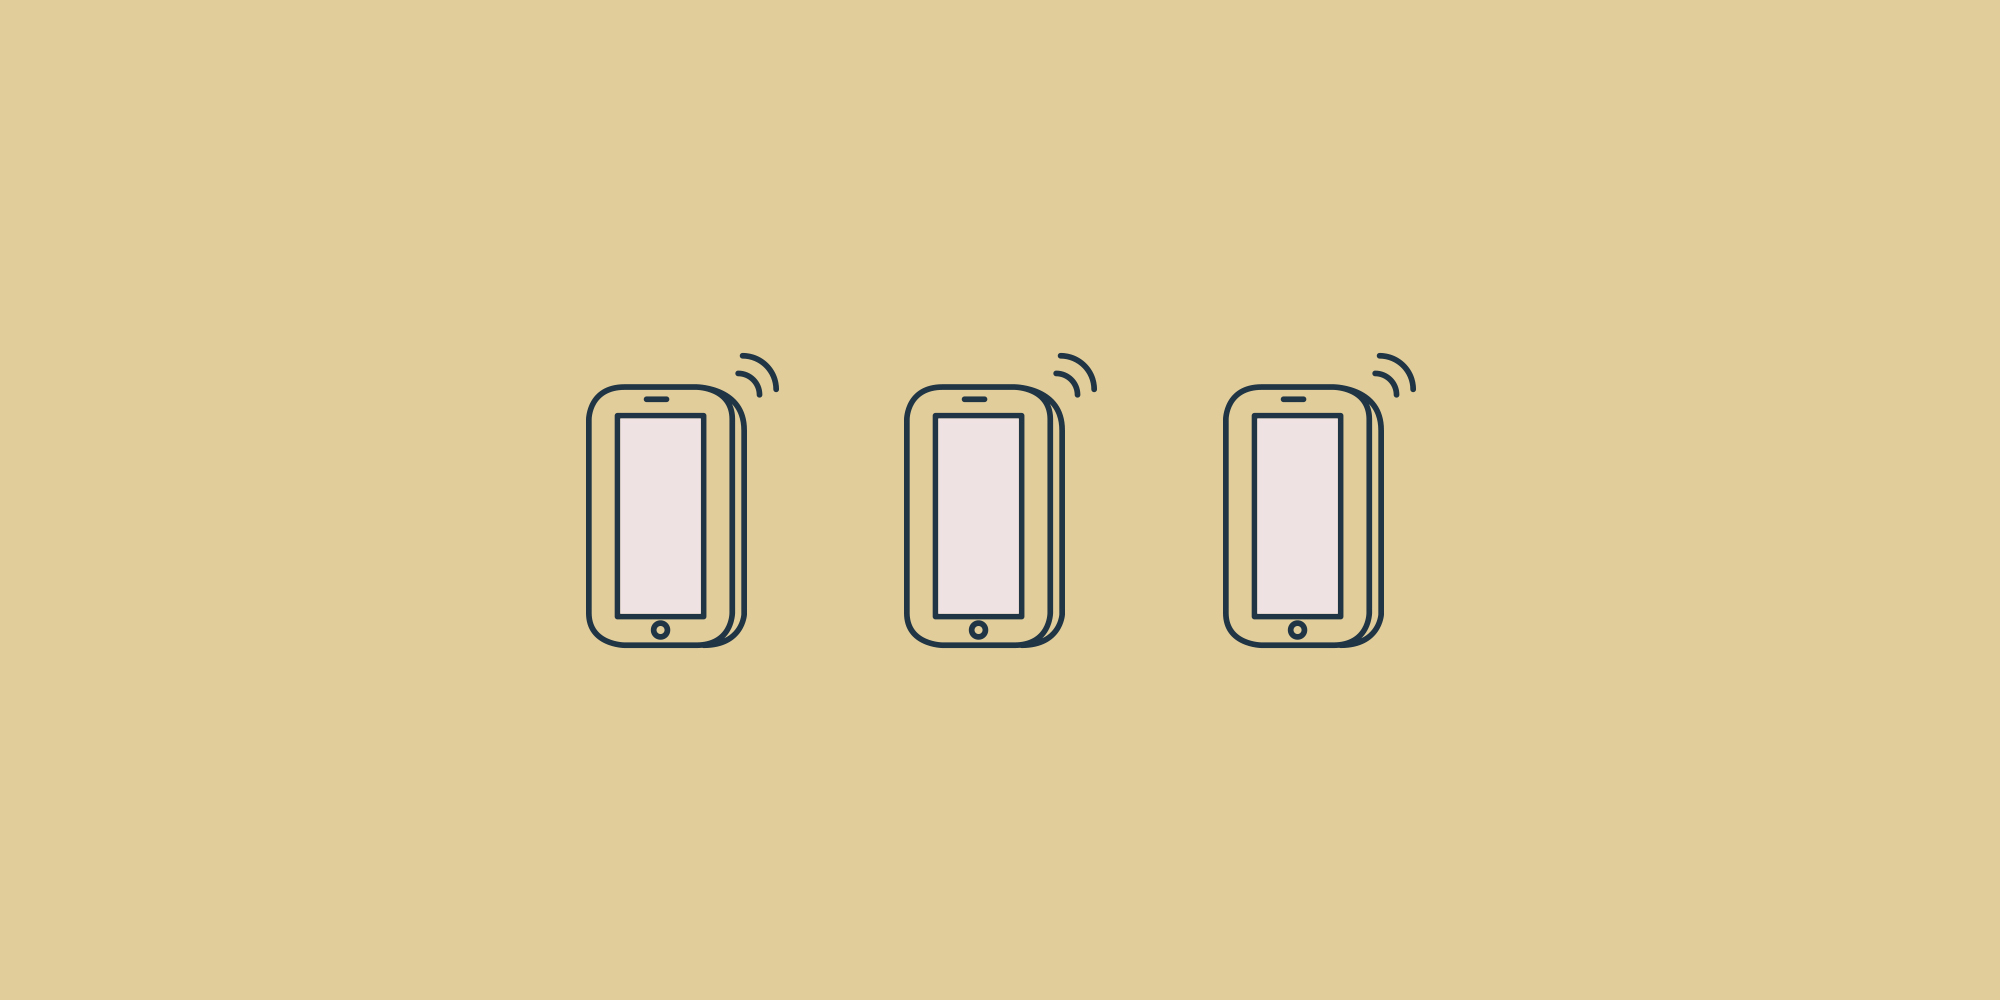 Three mobile phone icons